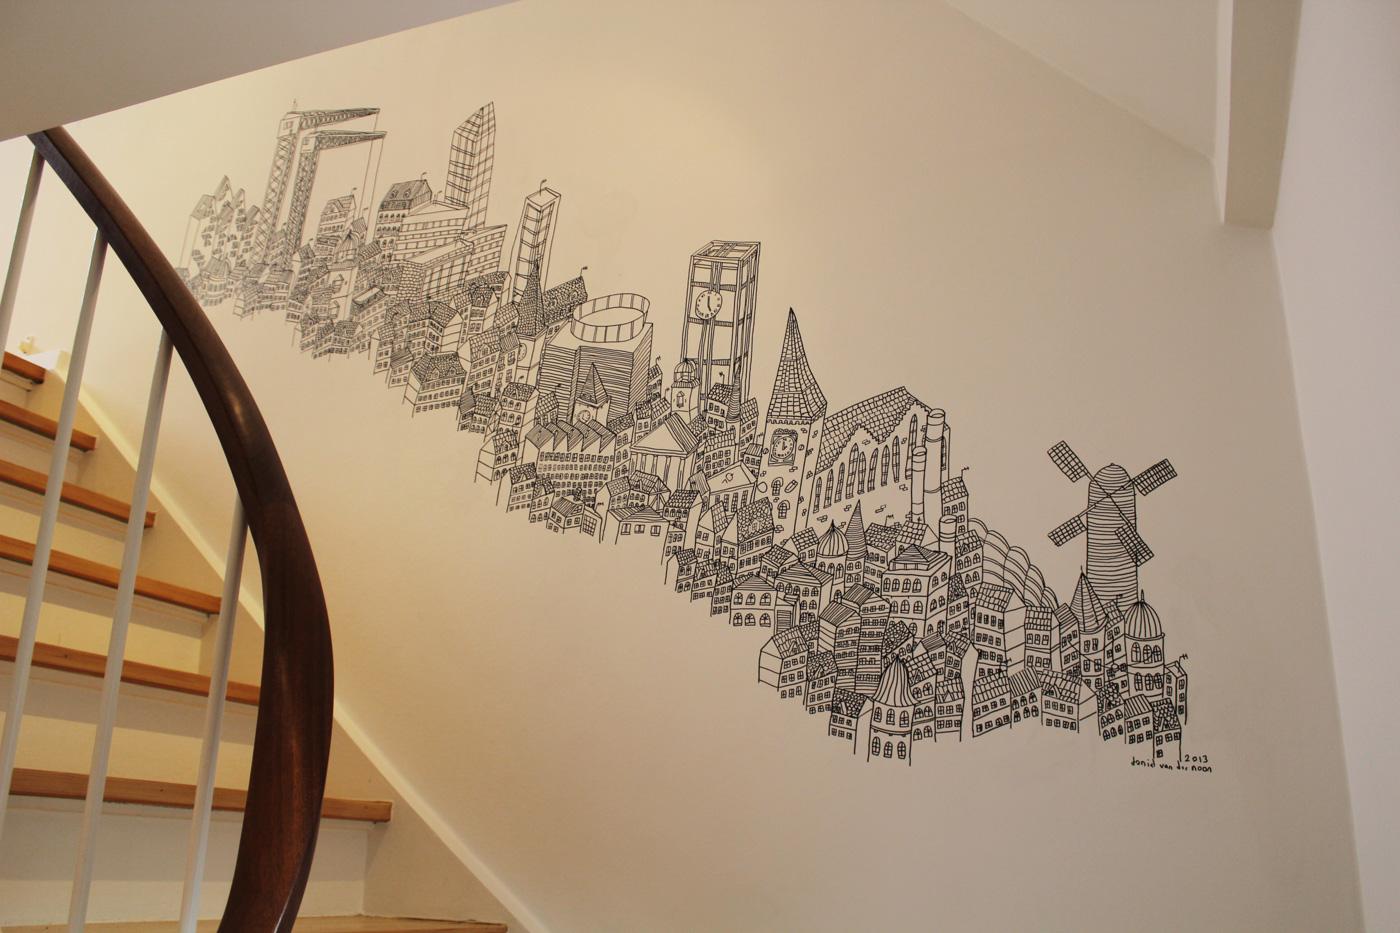 Incredible Mural Drawings by Sean Sullivan | Design Inspiration ...